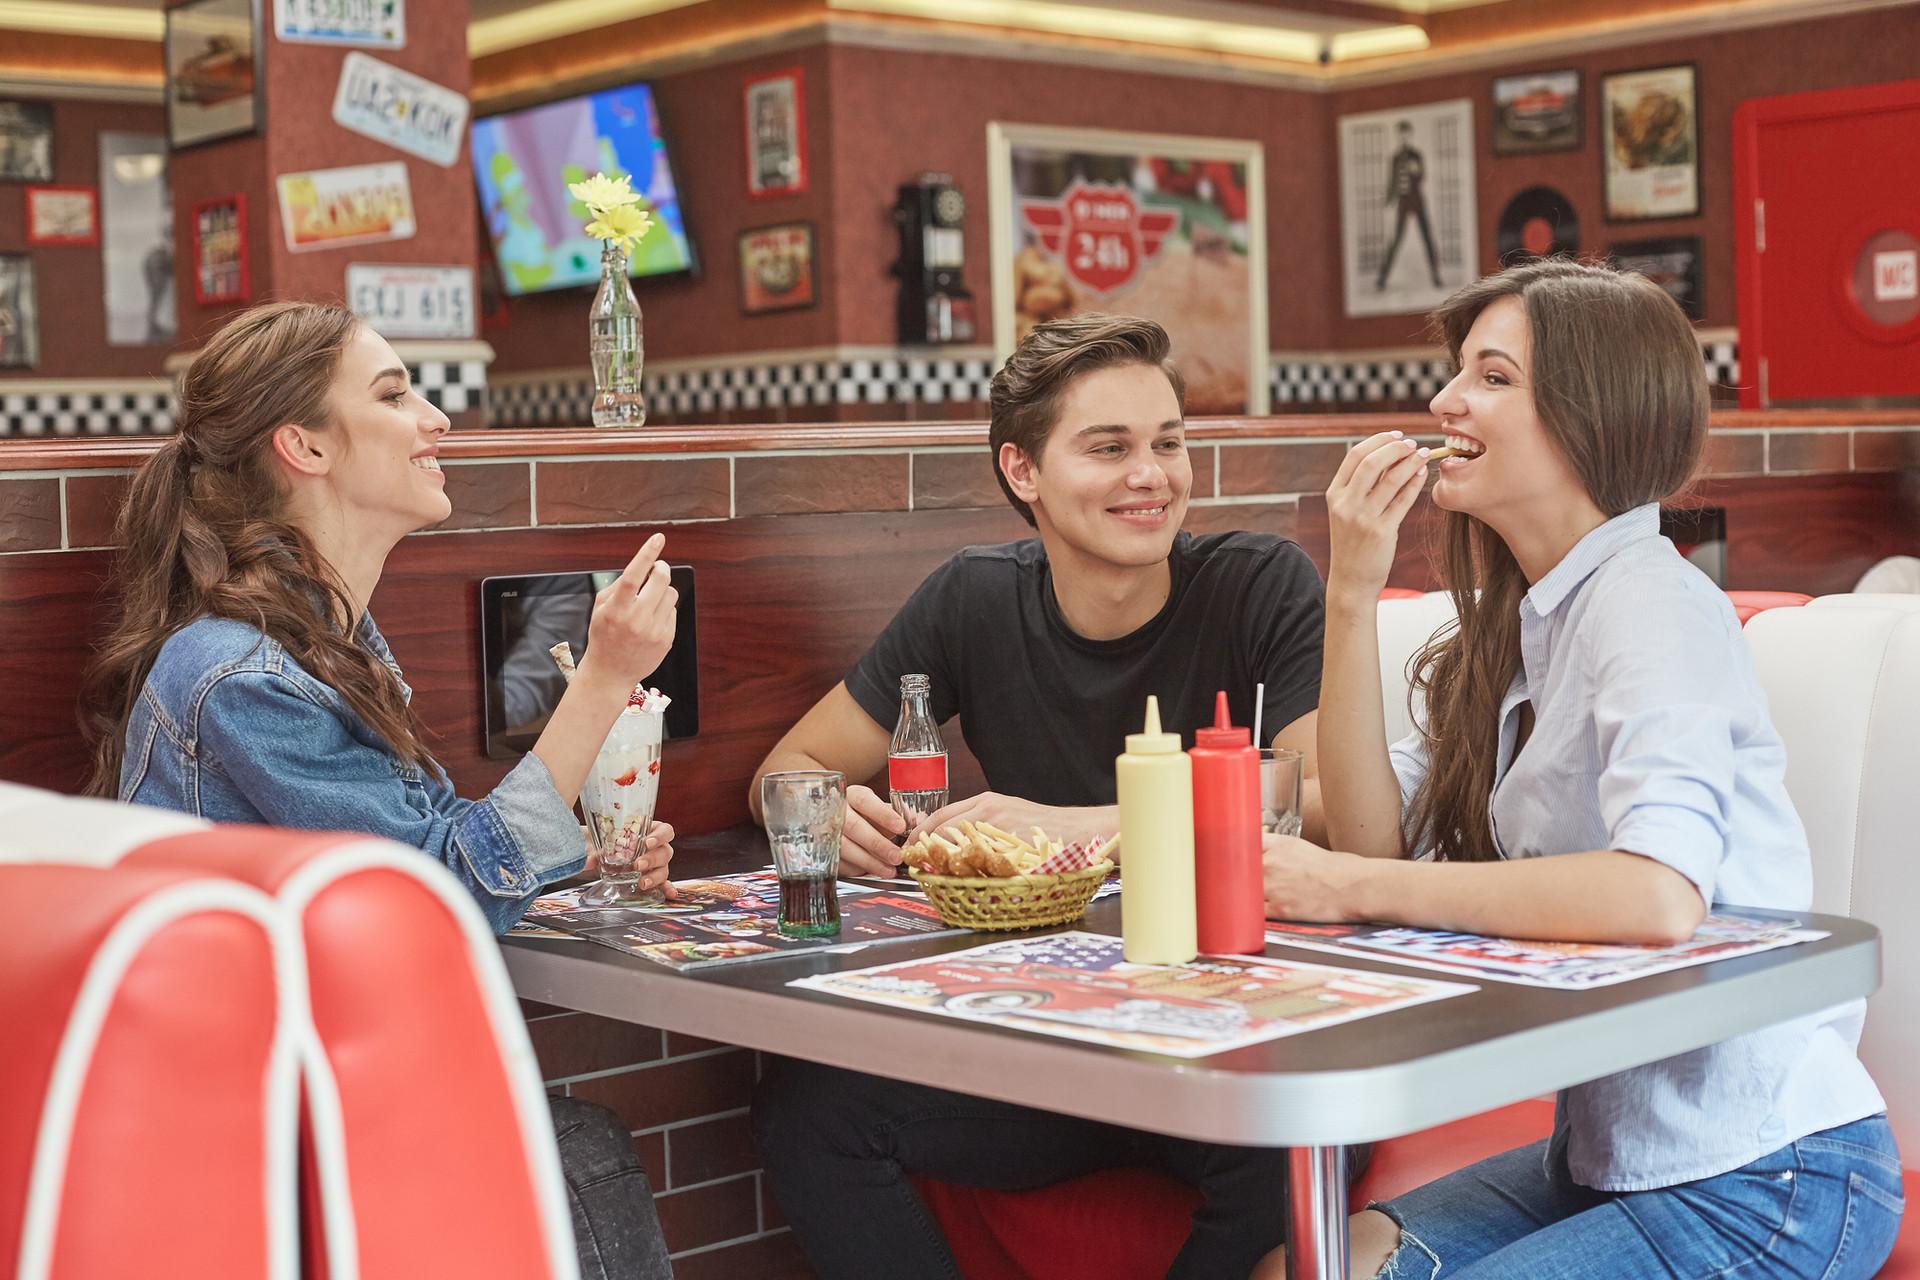 Eating at Diner